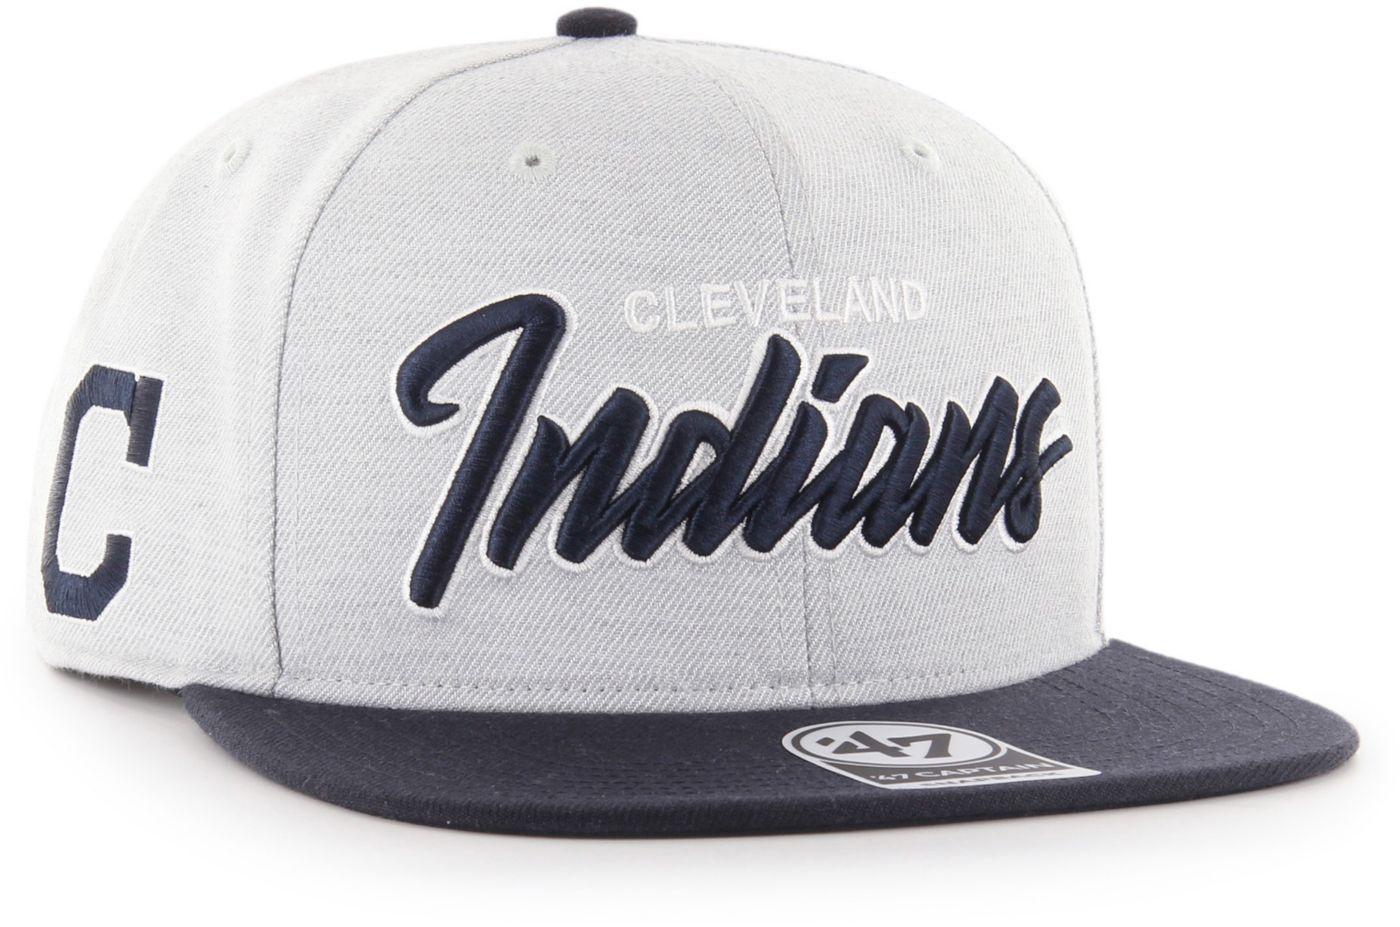 '47 Men's Cleveland Indians Street Script Captain Adjustable Snapback Hat